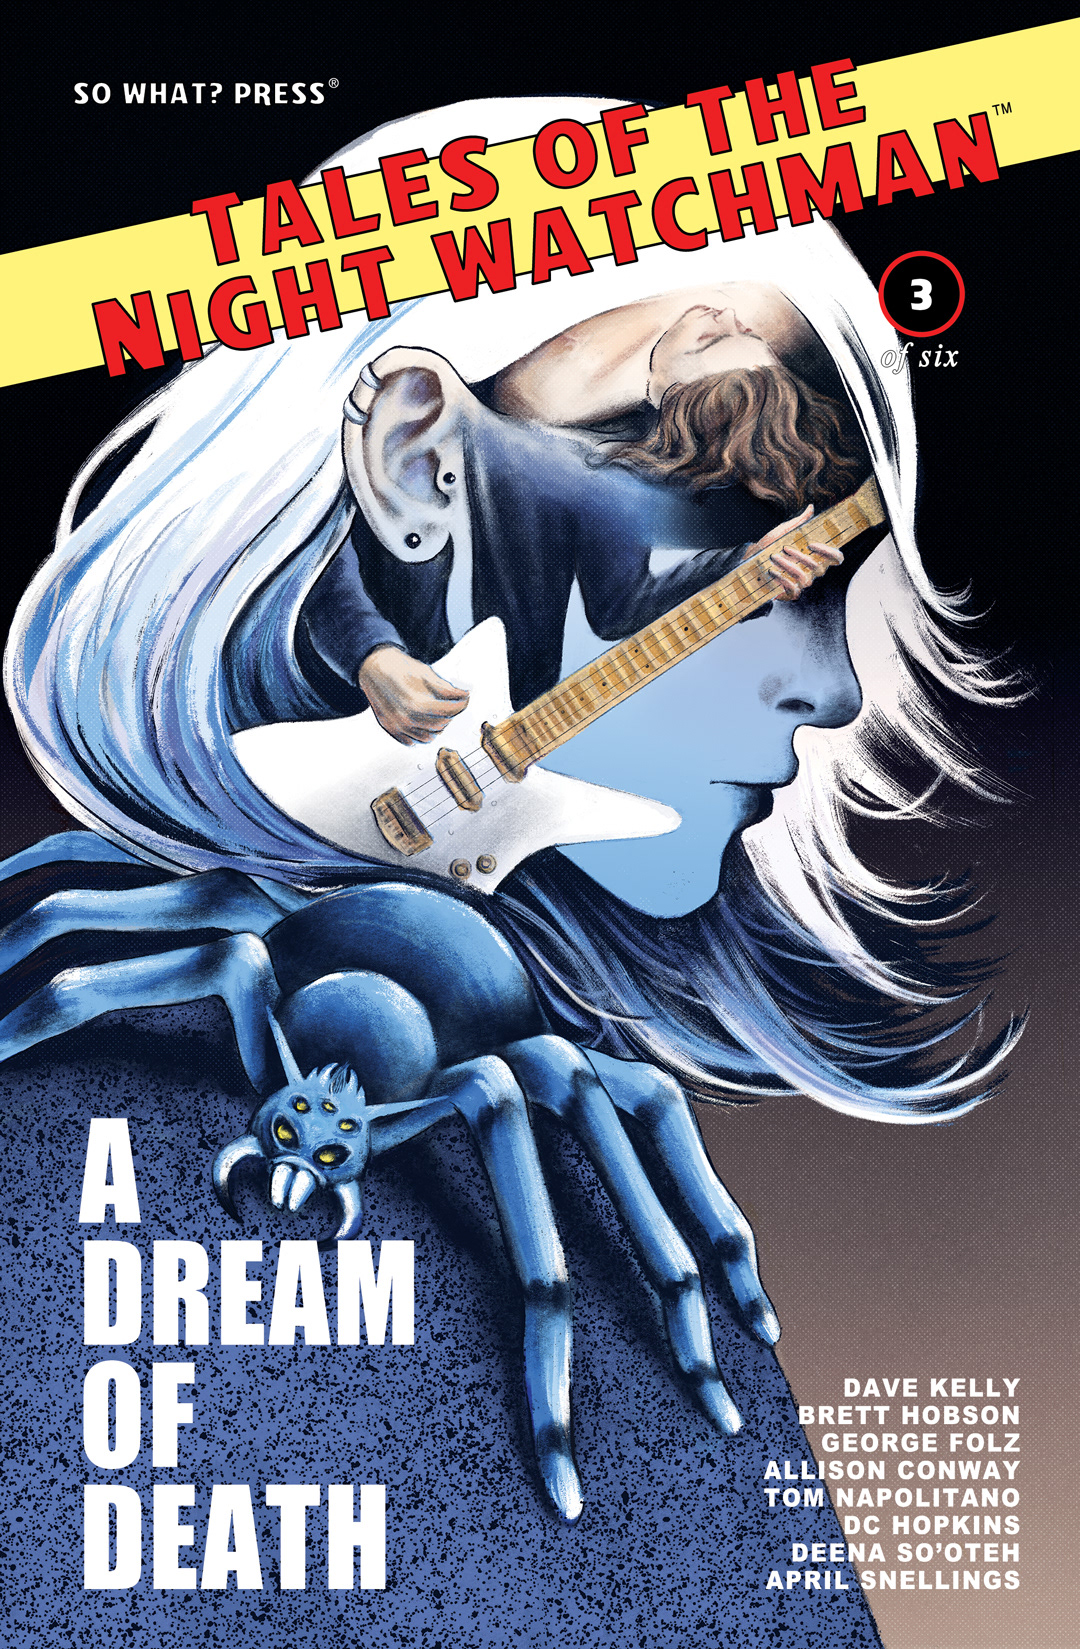 Comic Book Art comic book illustration Comicbook illustration cover illustration